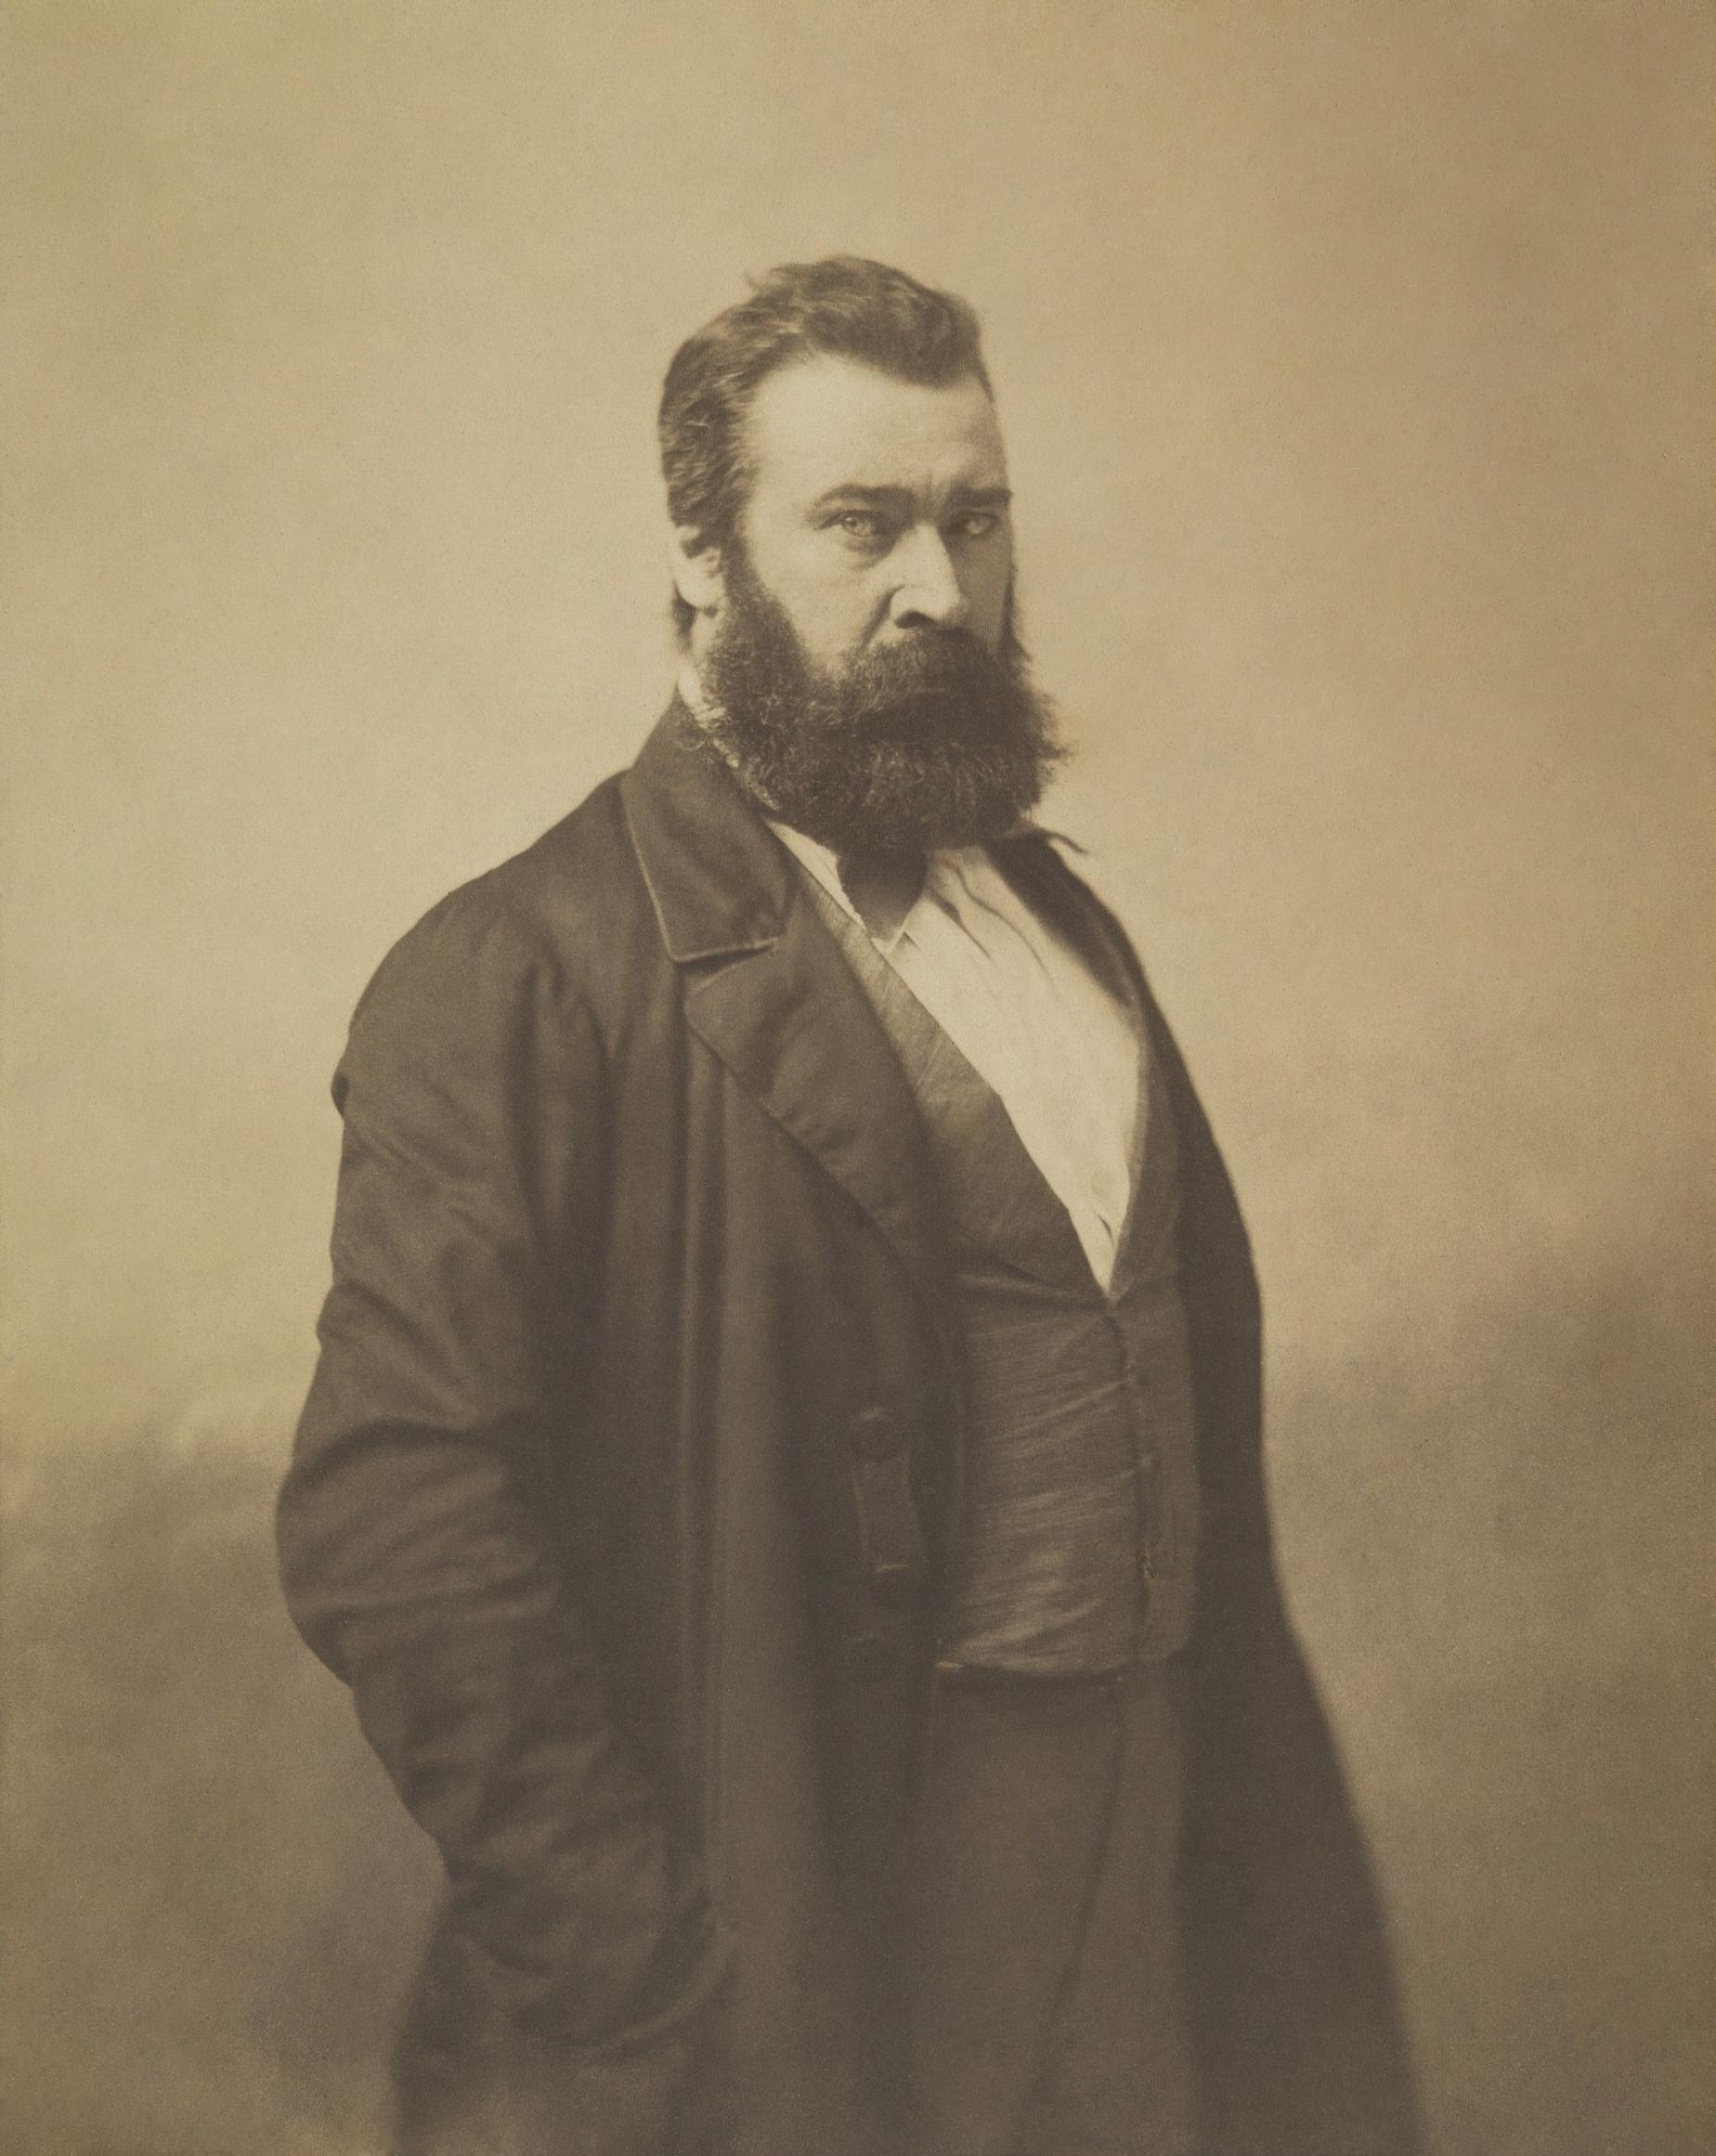 Image of Jean-François Millet from Wikidata